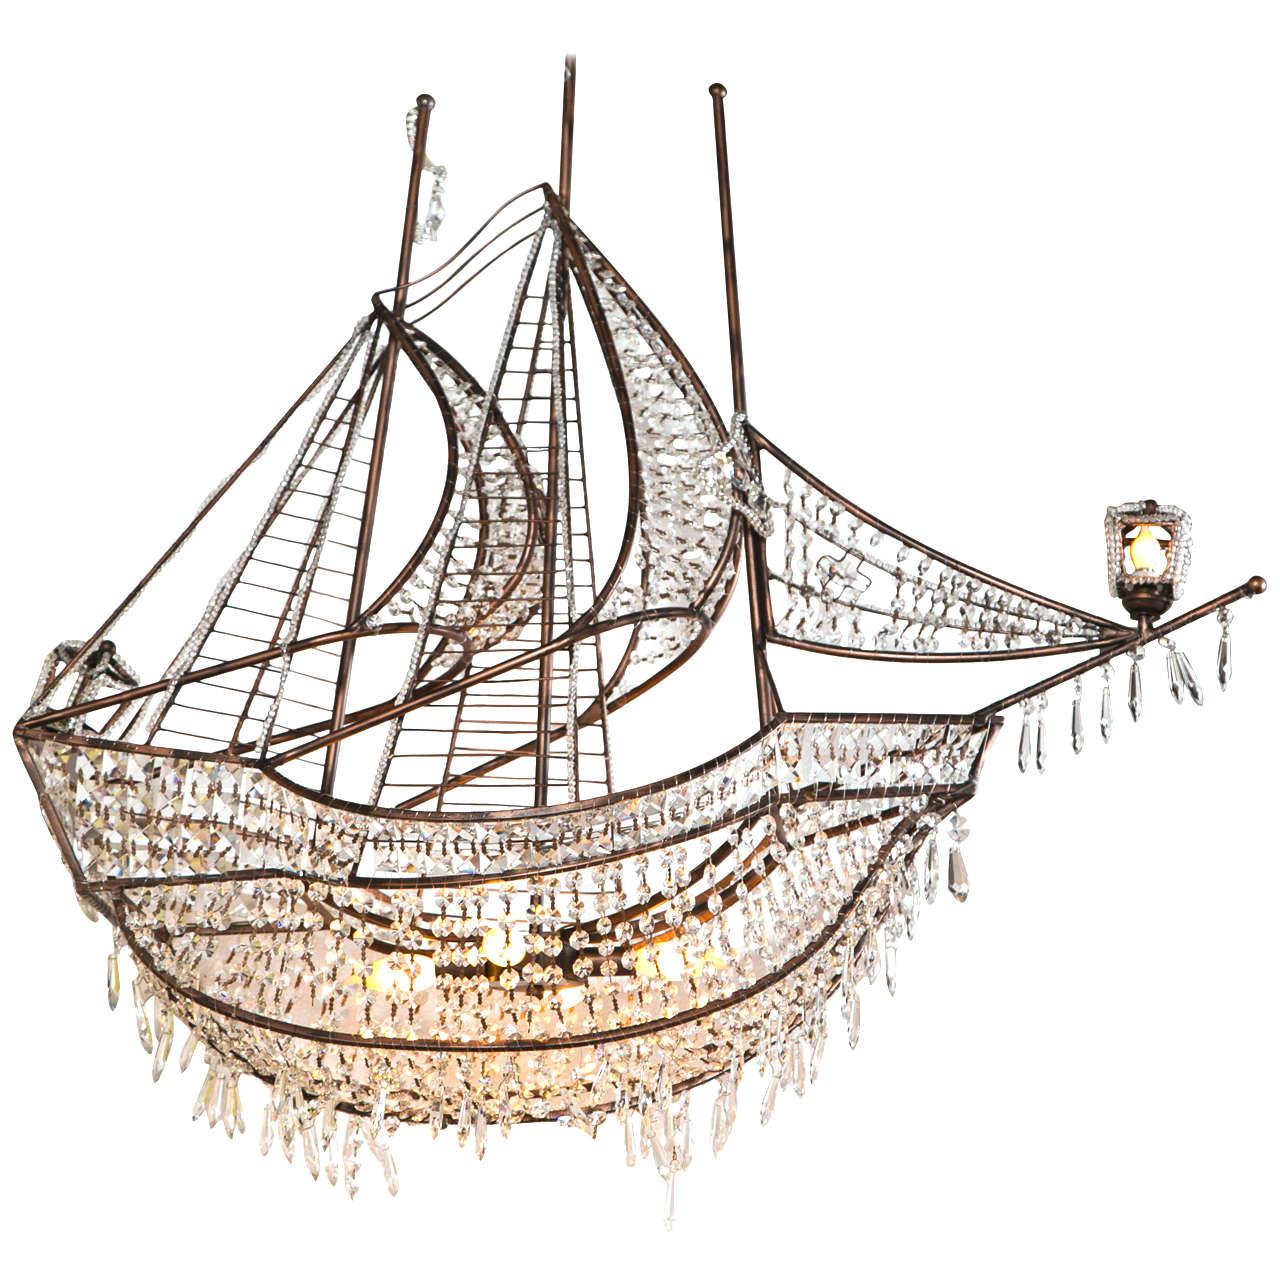 Antique crystal ship chandelier chandelier designs decorative iron and crystal ship chandelier at 1stdibs arubaitofo Choice Image